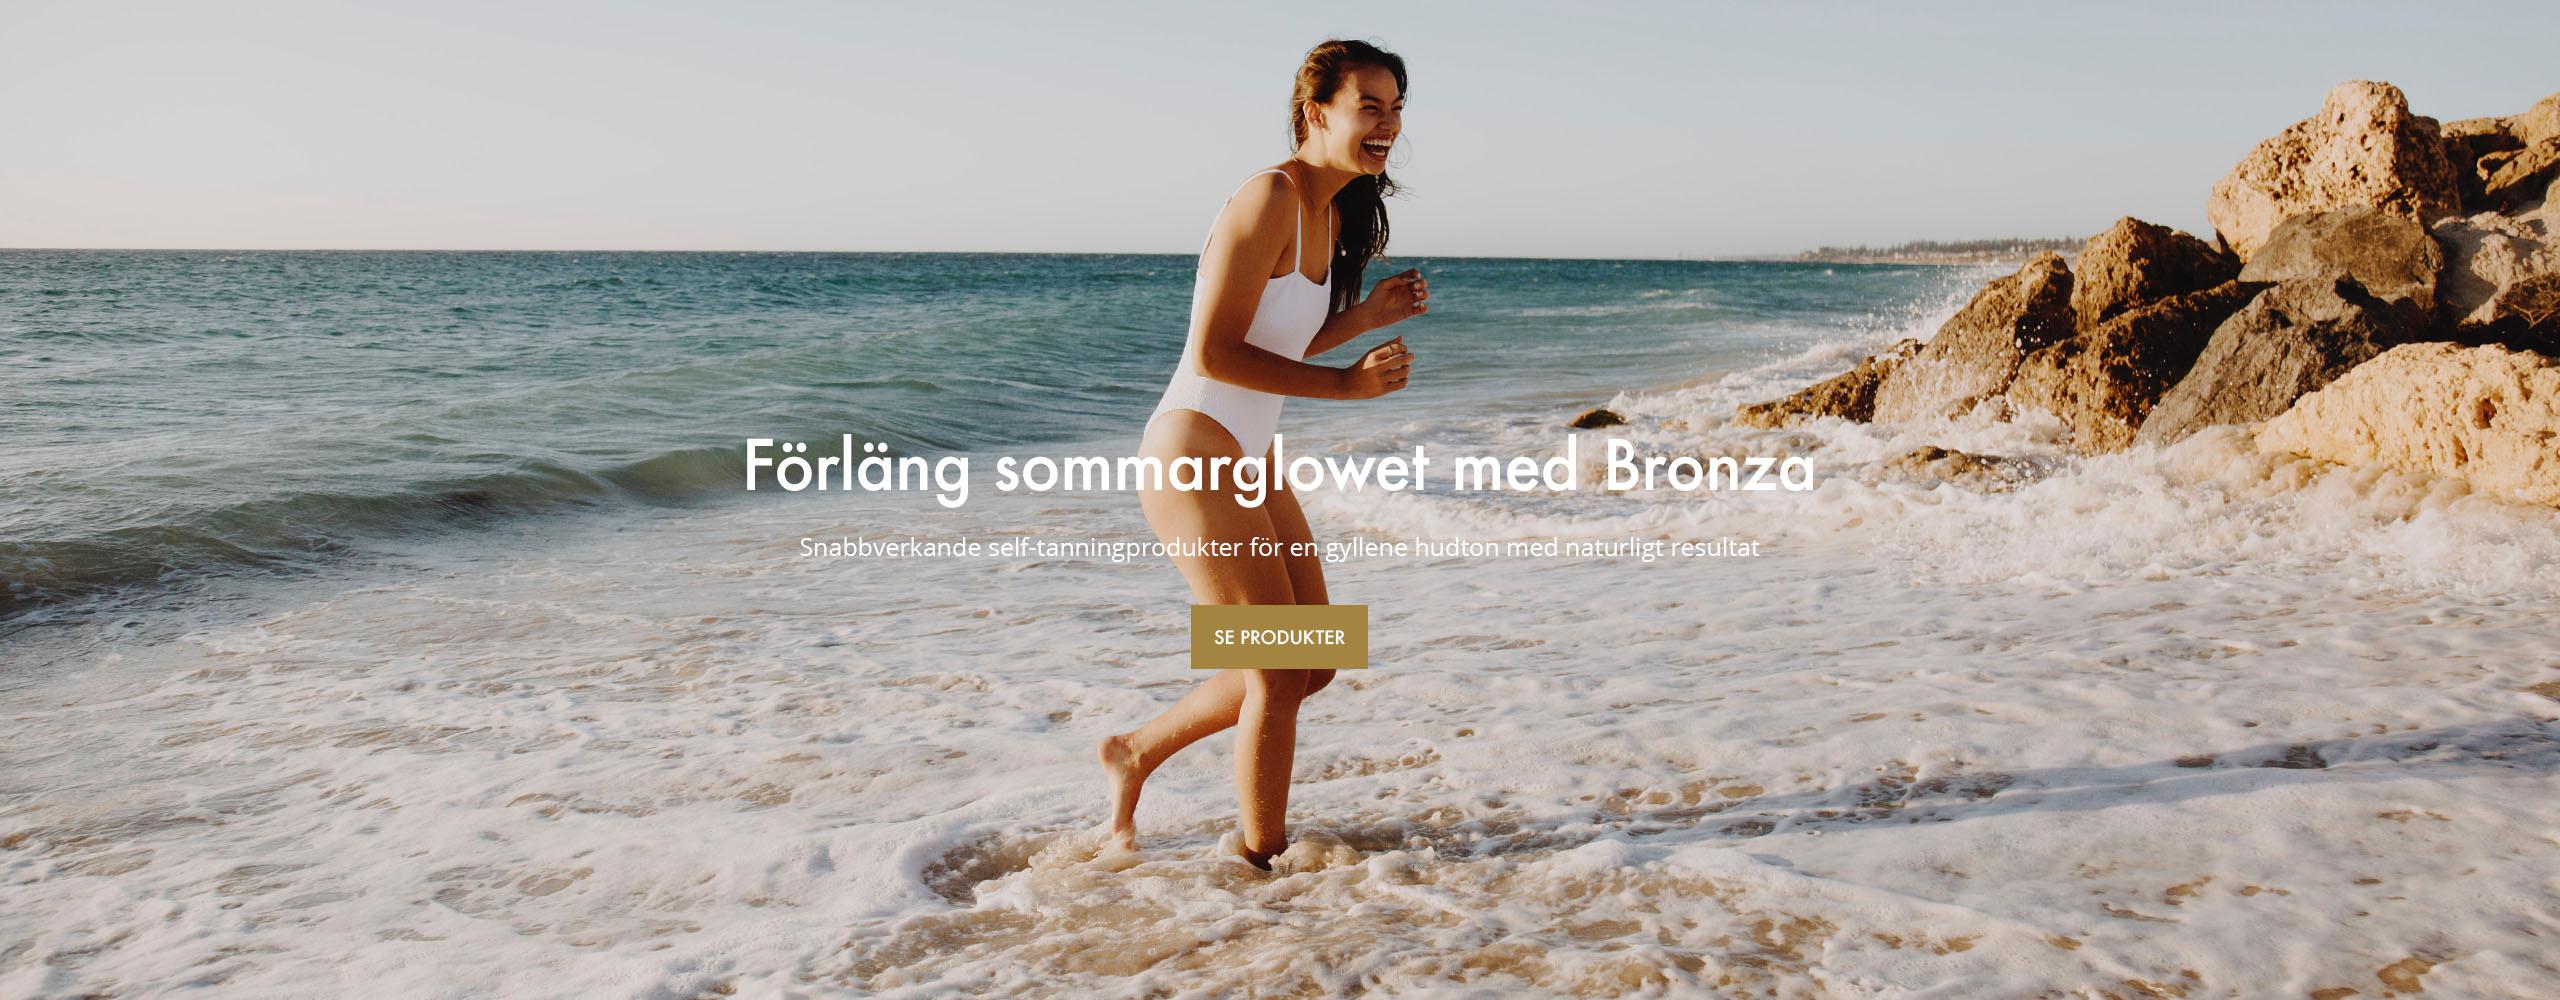 https://www.bronza.se/image/887/Header-sv-forlang-sommarglowet-med-bronza_bronzing-mousse2.jpg